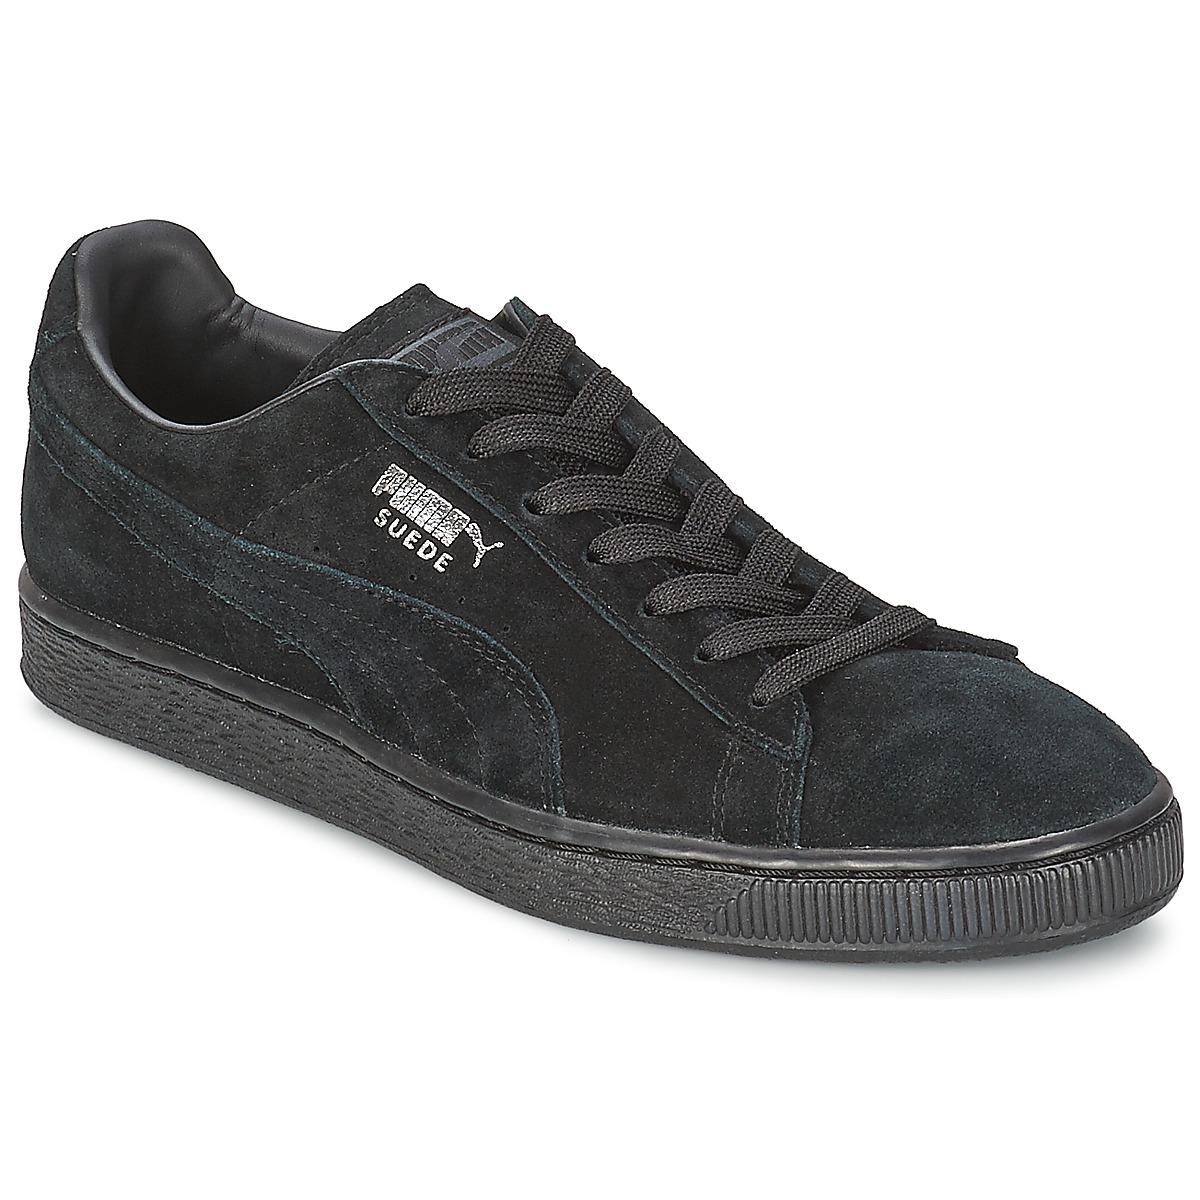 7737bfc5623a ... Puma SUEDE CLASSIC Schwarz   Grau - Kostenloser Versand bei Sneaker  Spartoode ! - Schuhe Sneaker